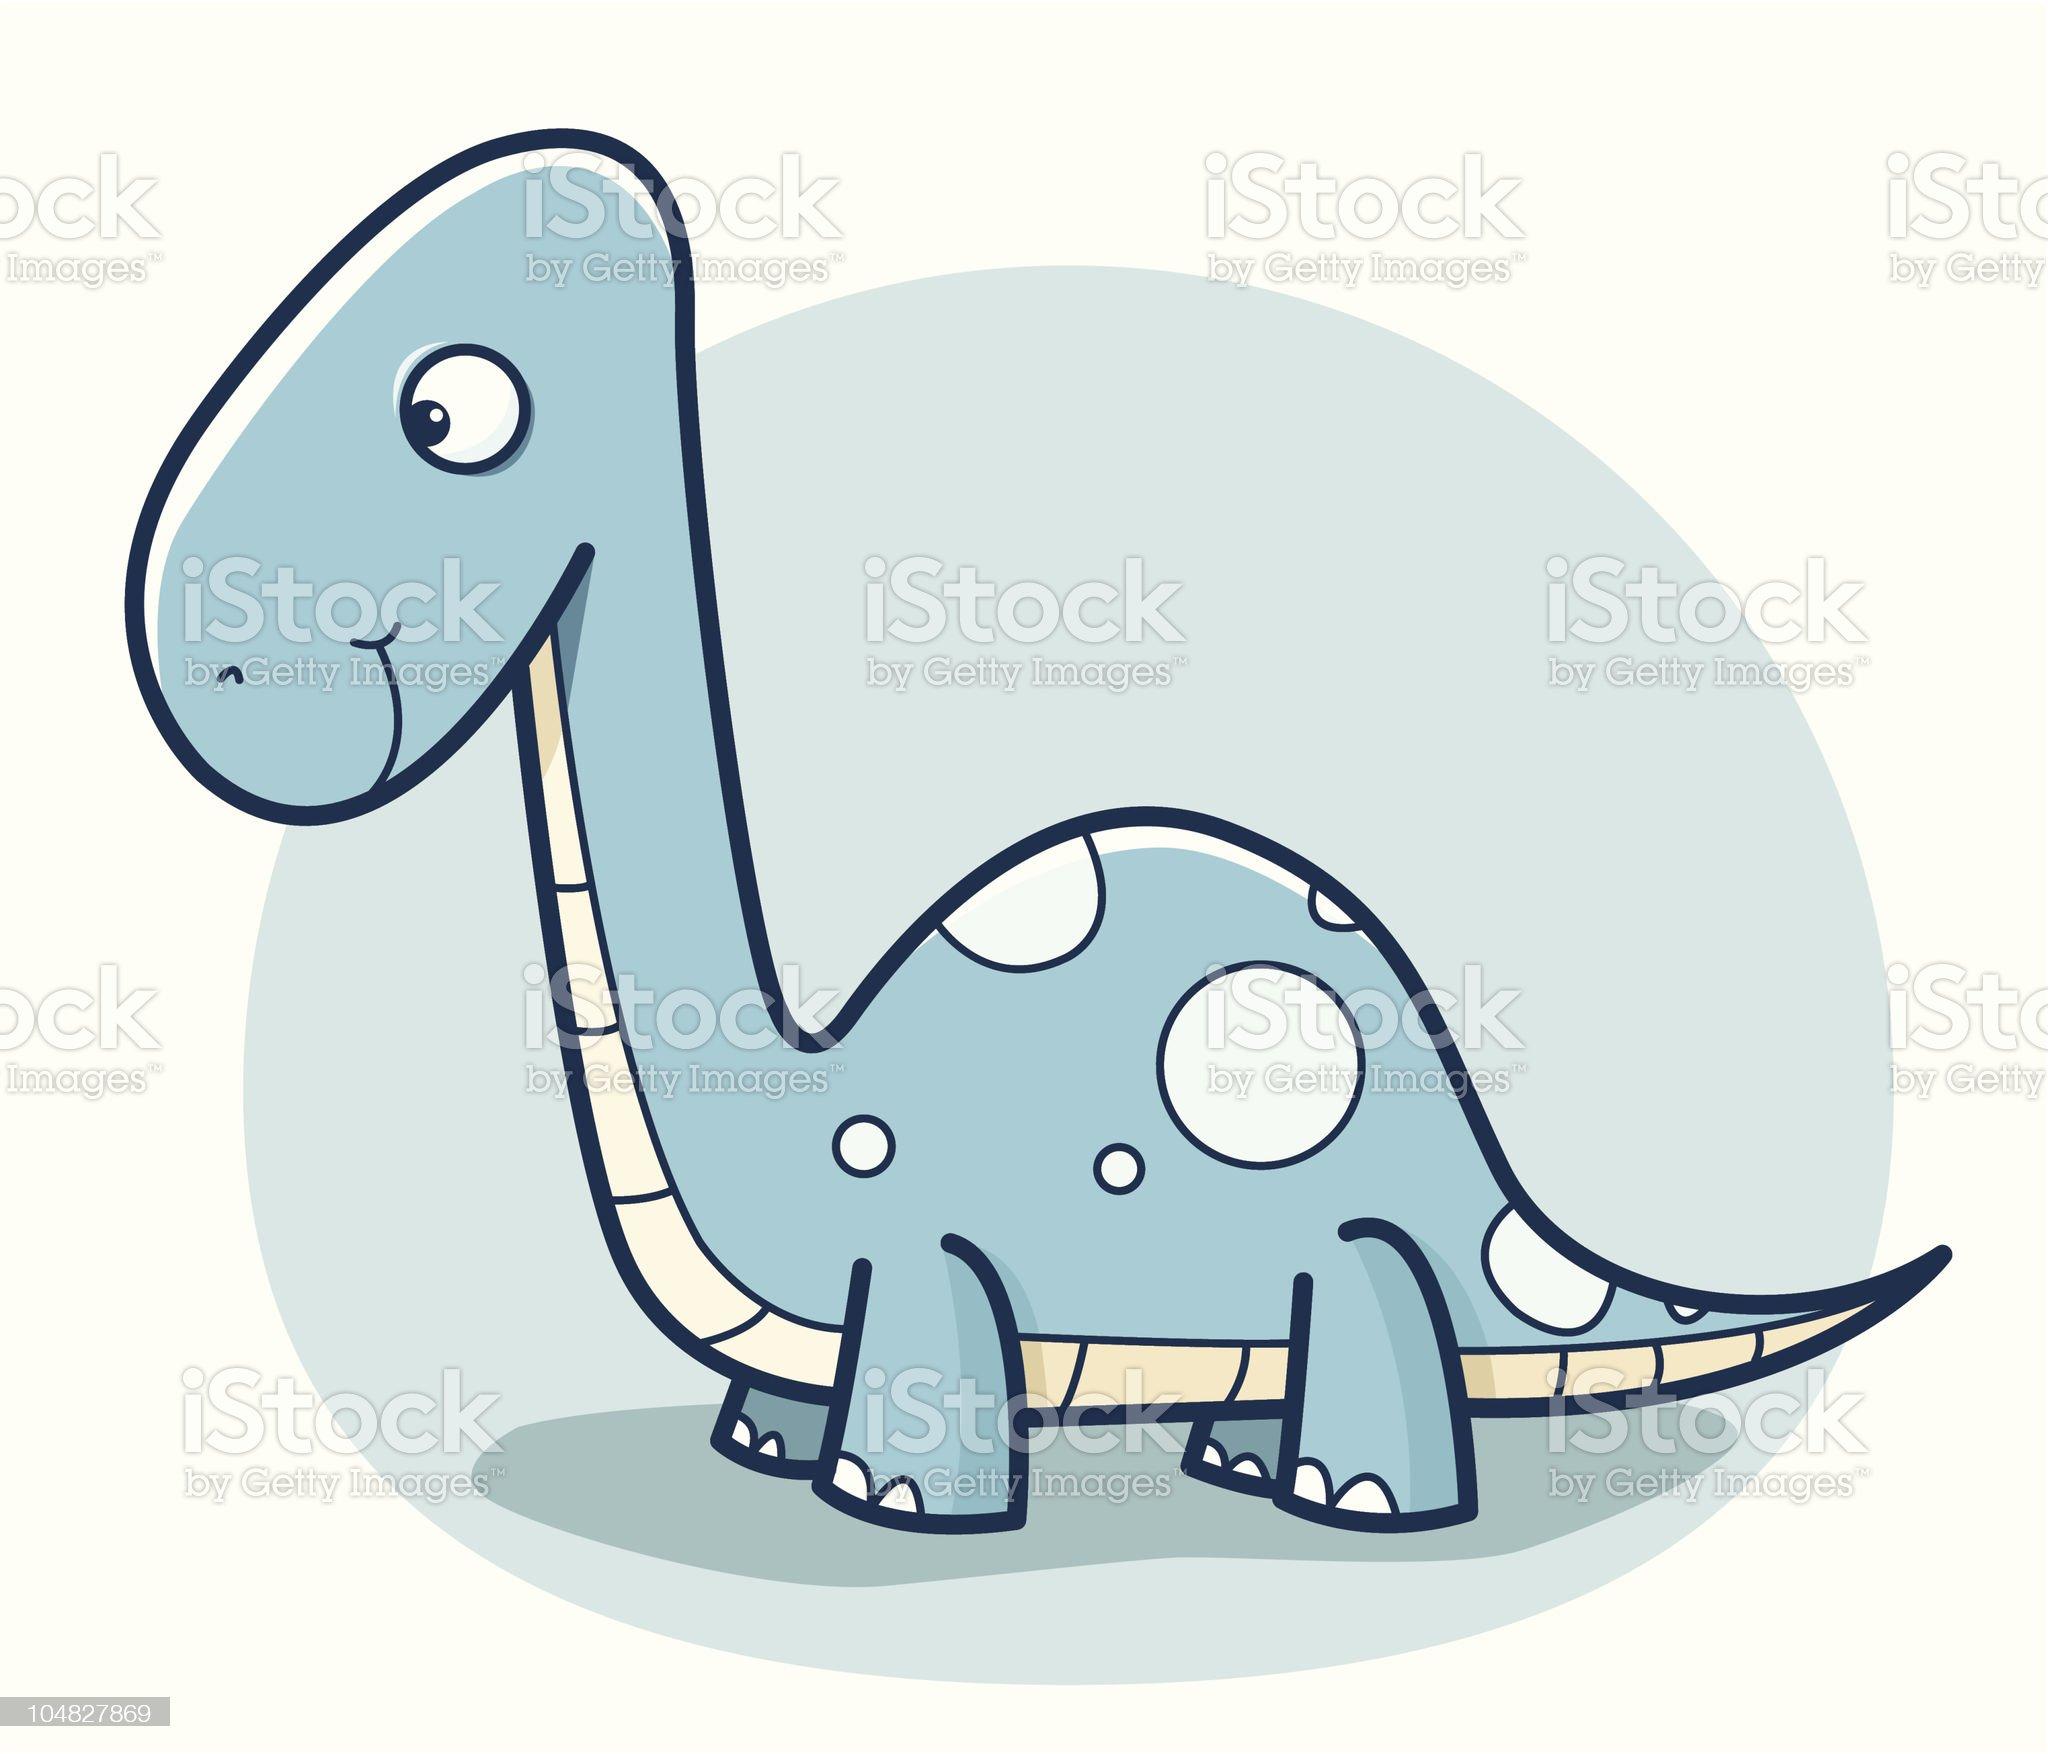 cartoon dinosaur royalty-free stock vector art